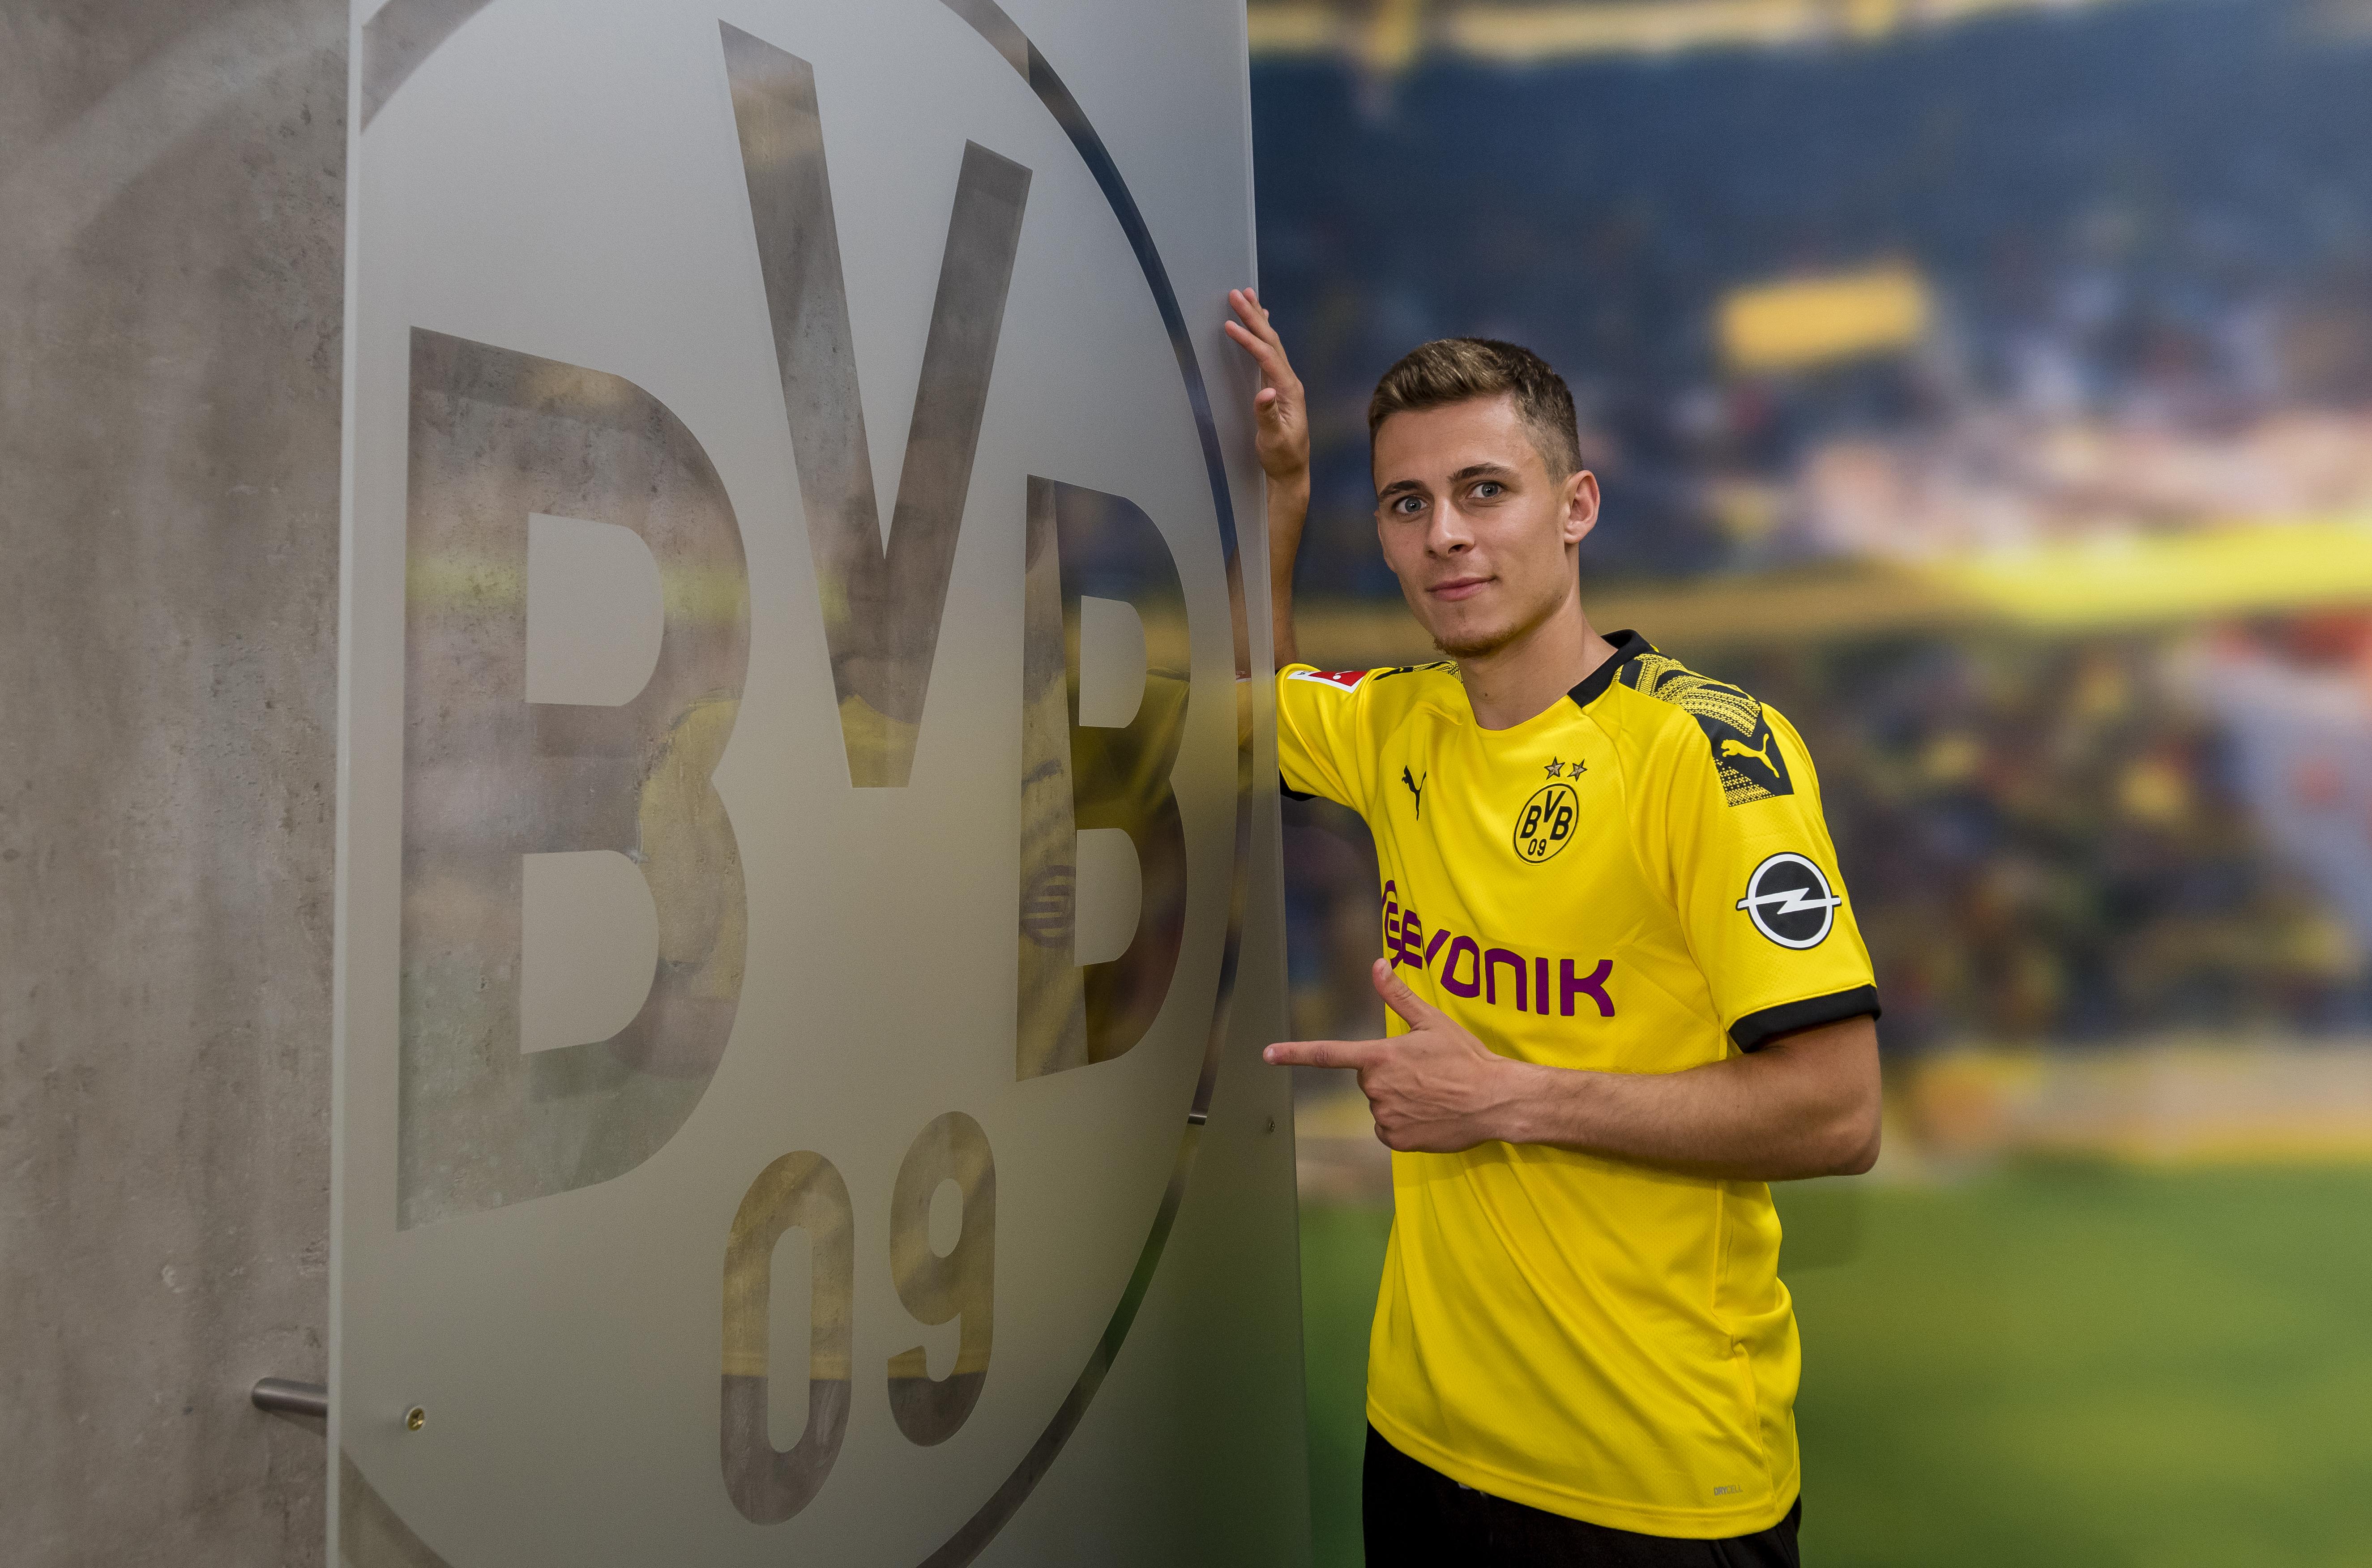 Thoirgan Hazard Borussia Dortmund